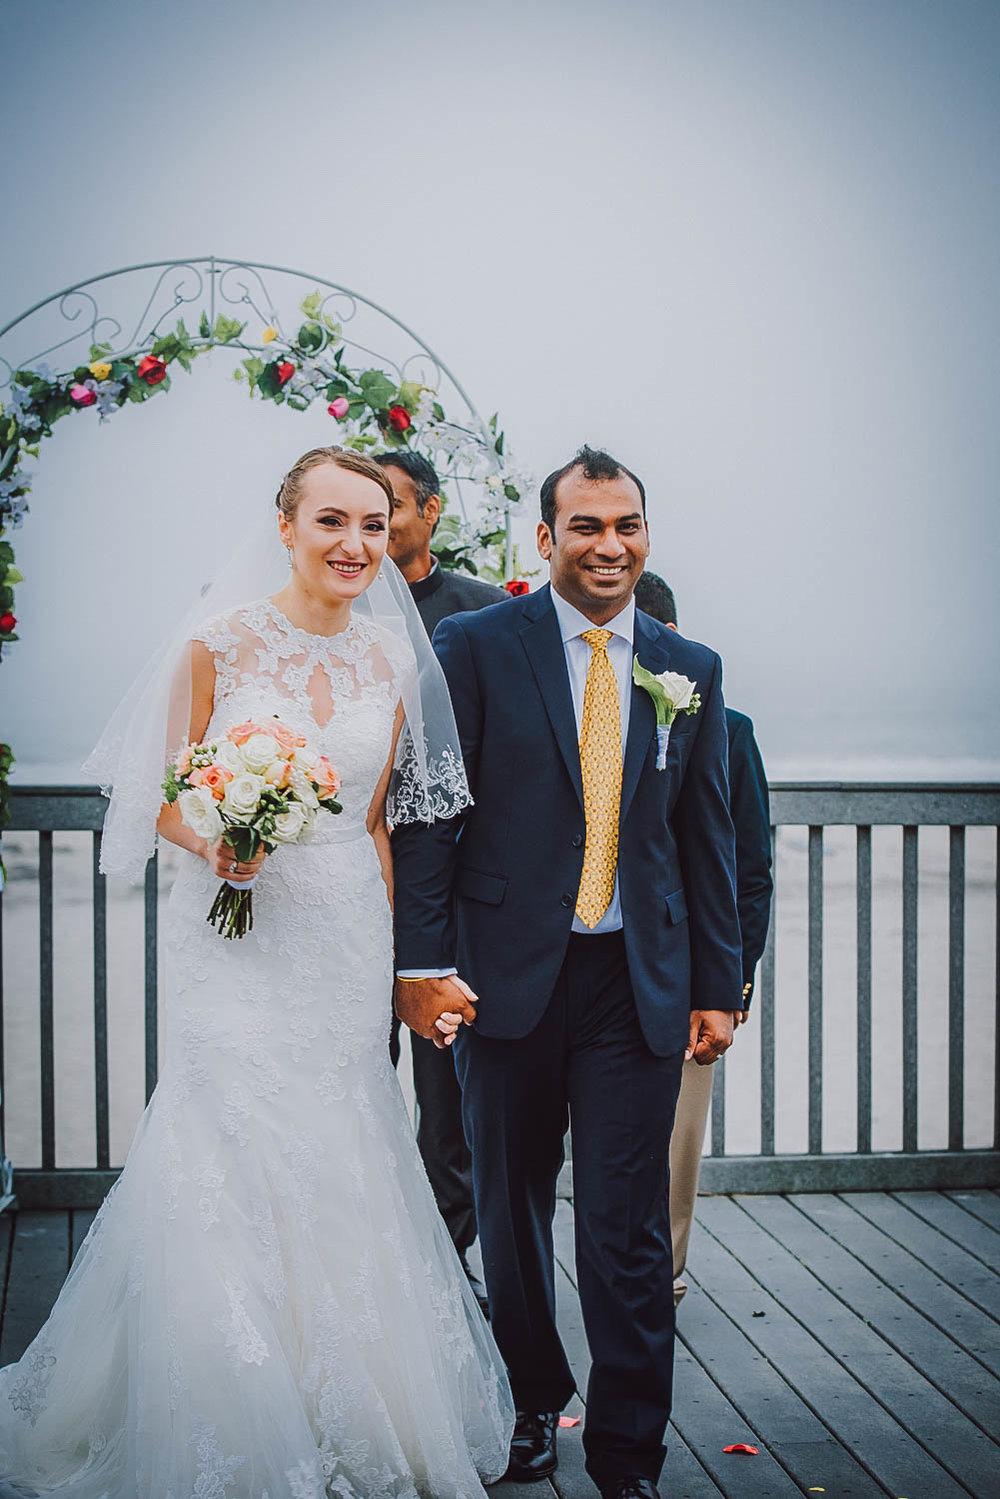 ecaterina-chandu-dondeti-wedding-photography31.jpg